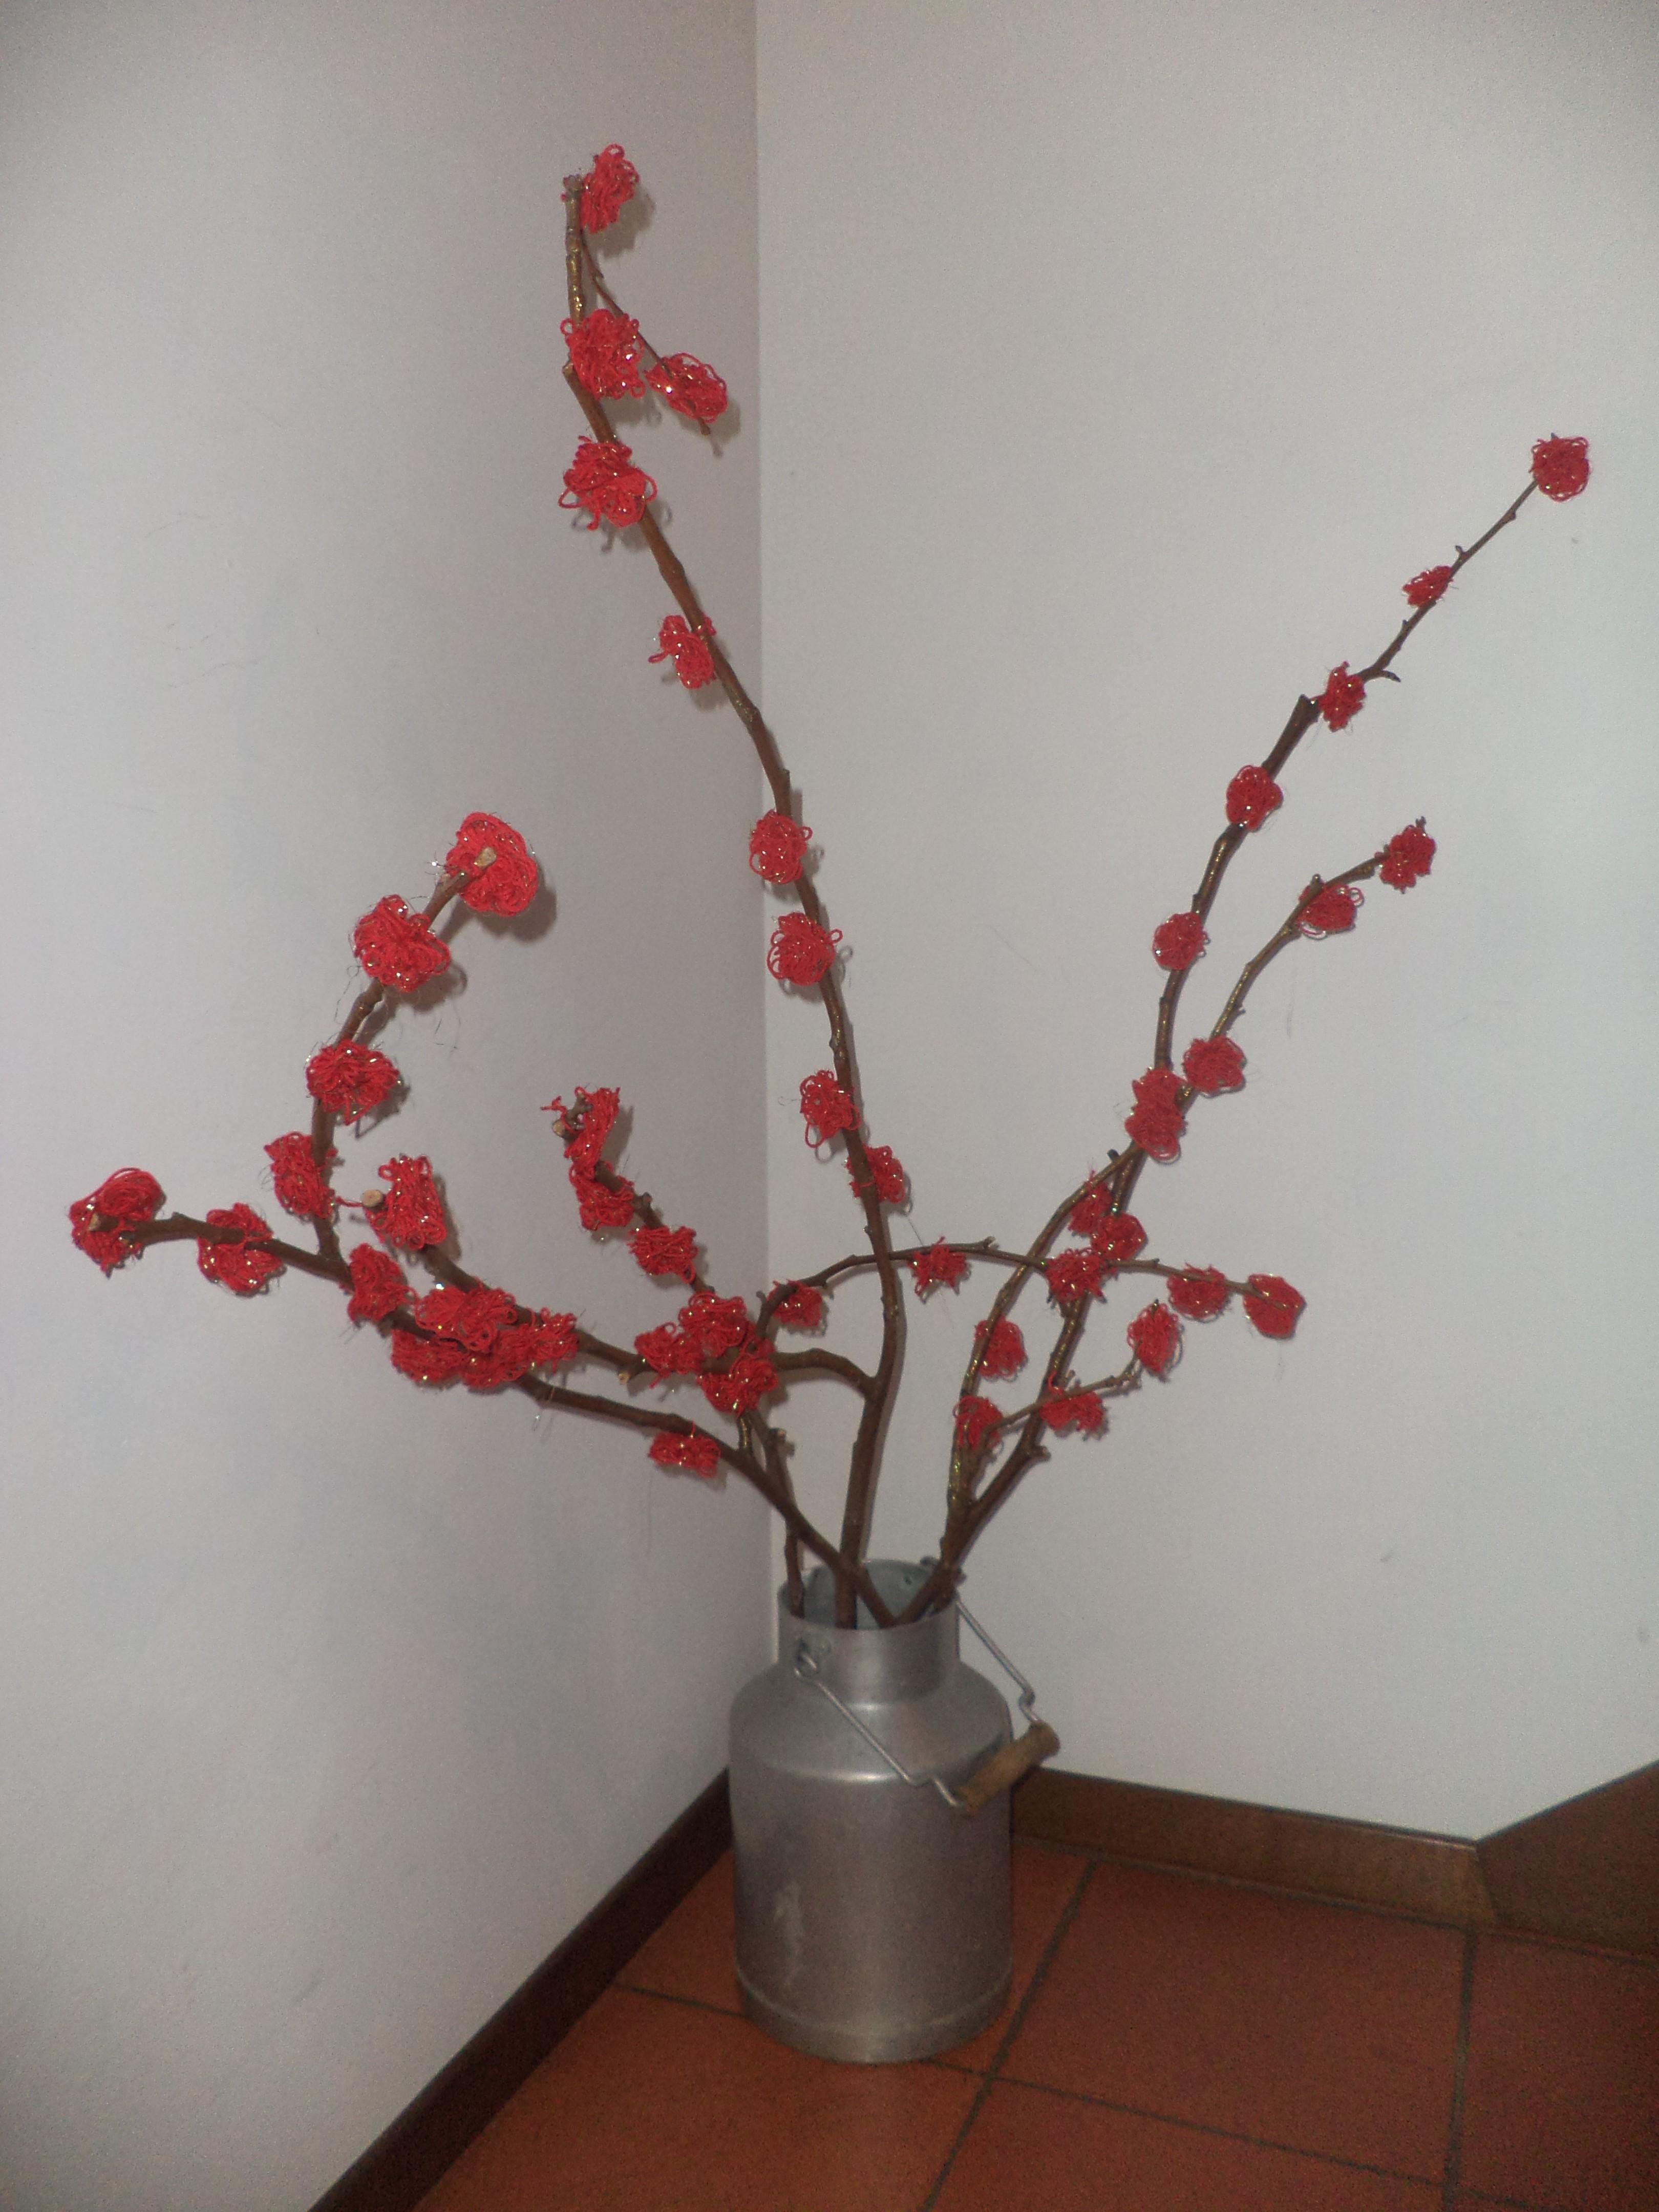 Gennaio 2013 1oceanoxculla - Rami secchi decorativi dove comprarli ...